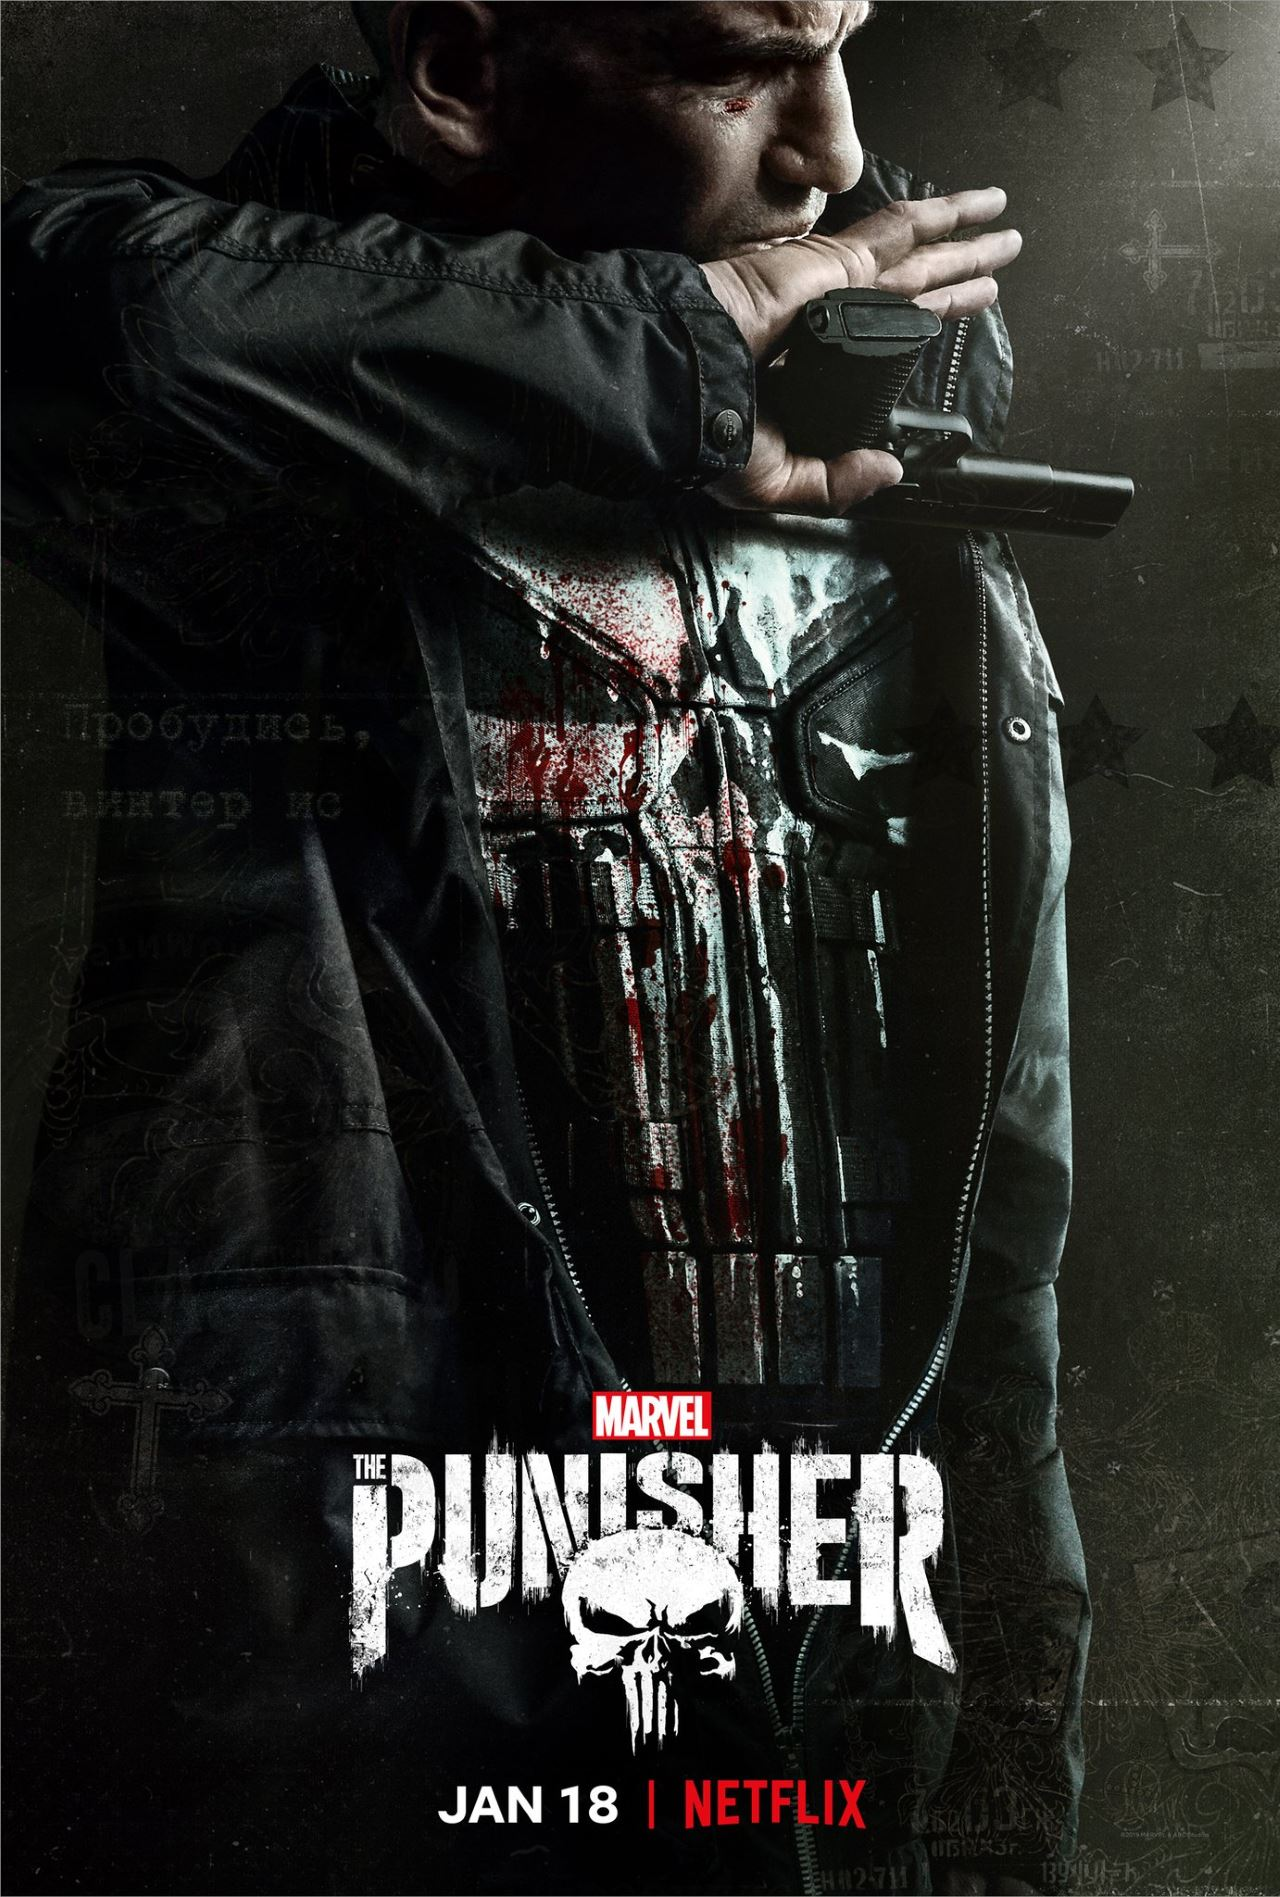 the punisher season 2 poster frank castle The Punisher season 2